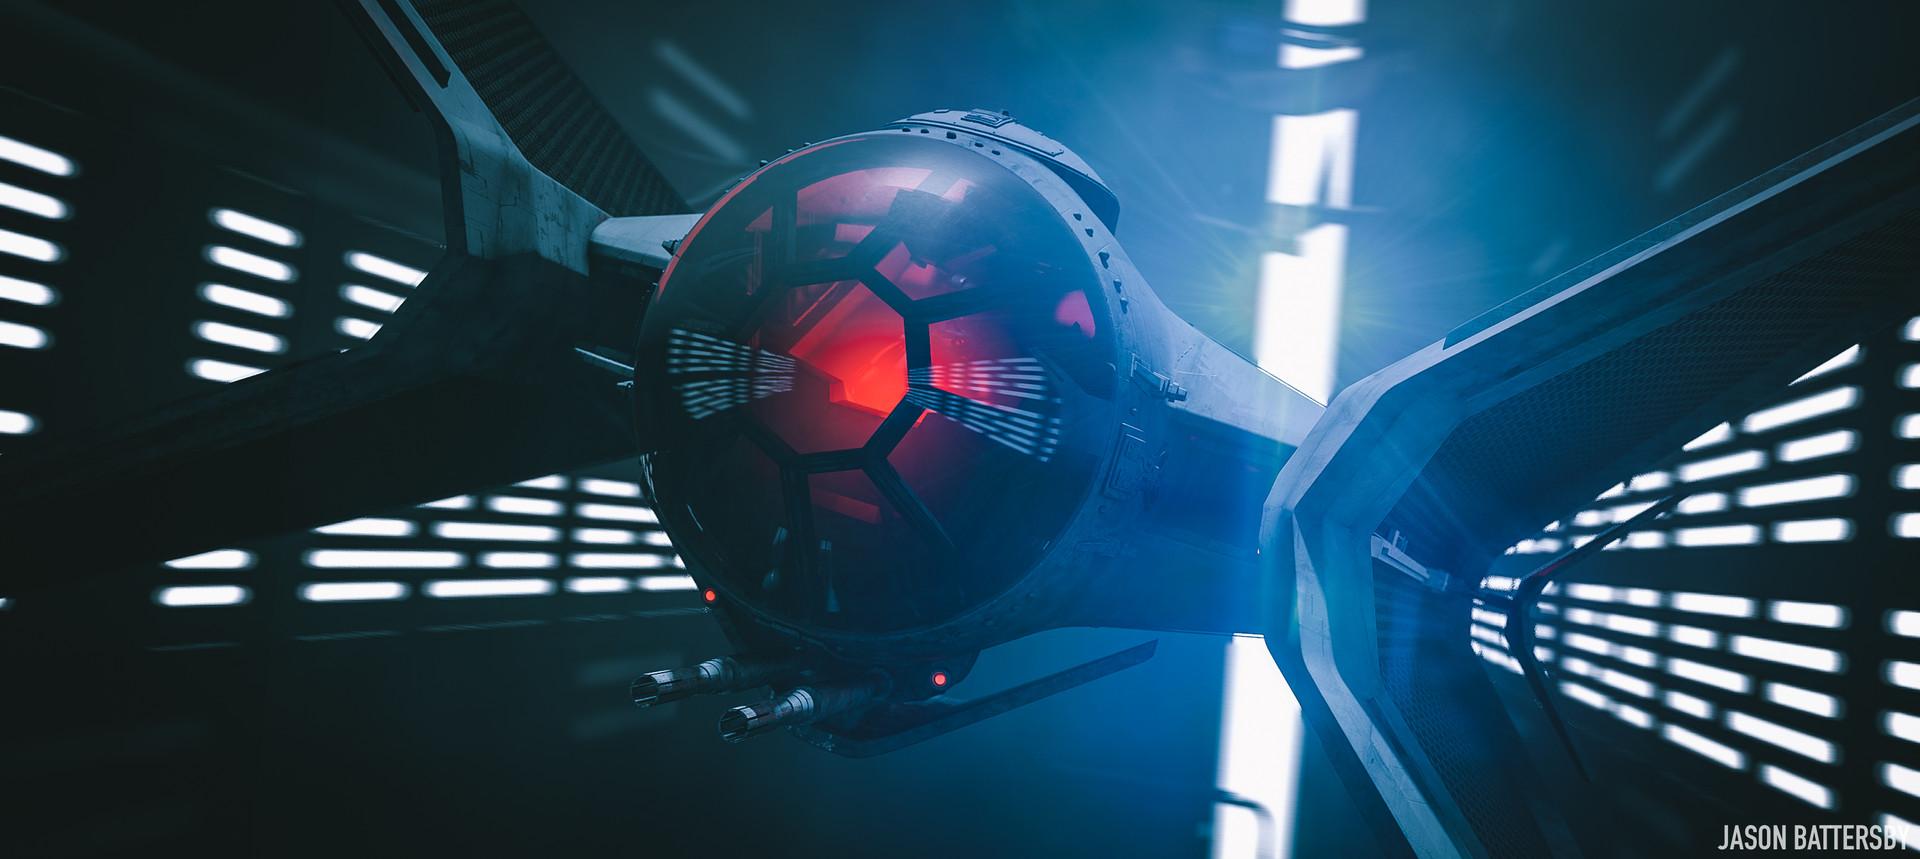 Wallpaper Digital Art Concept Art Star Wars Tie Fighter